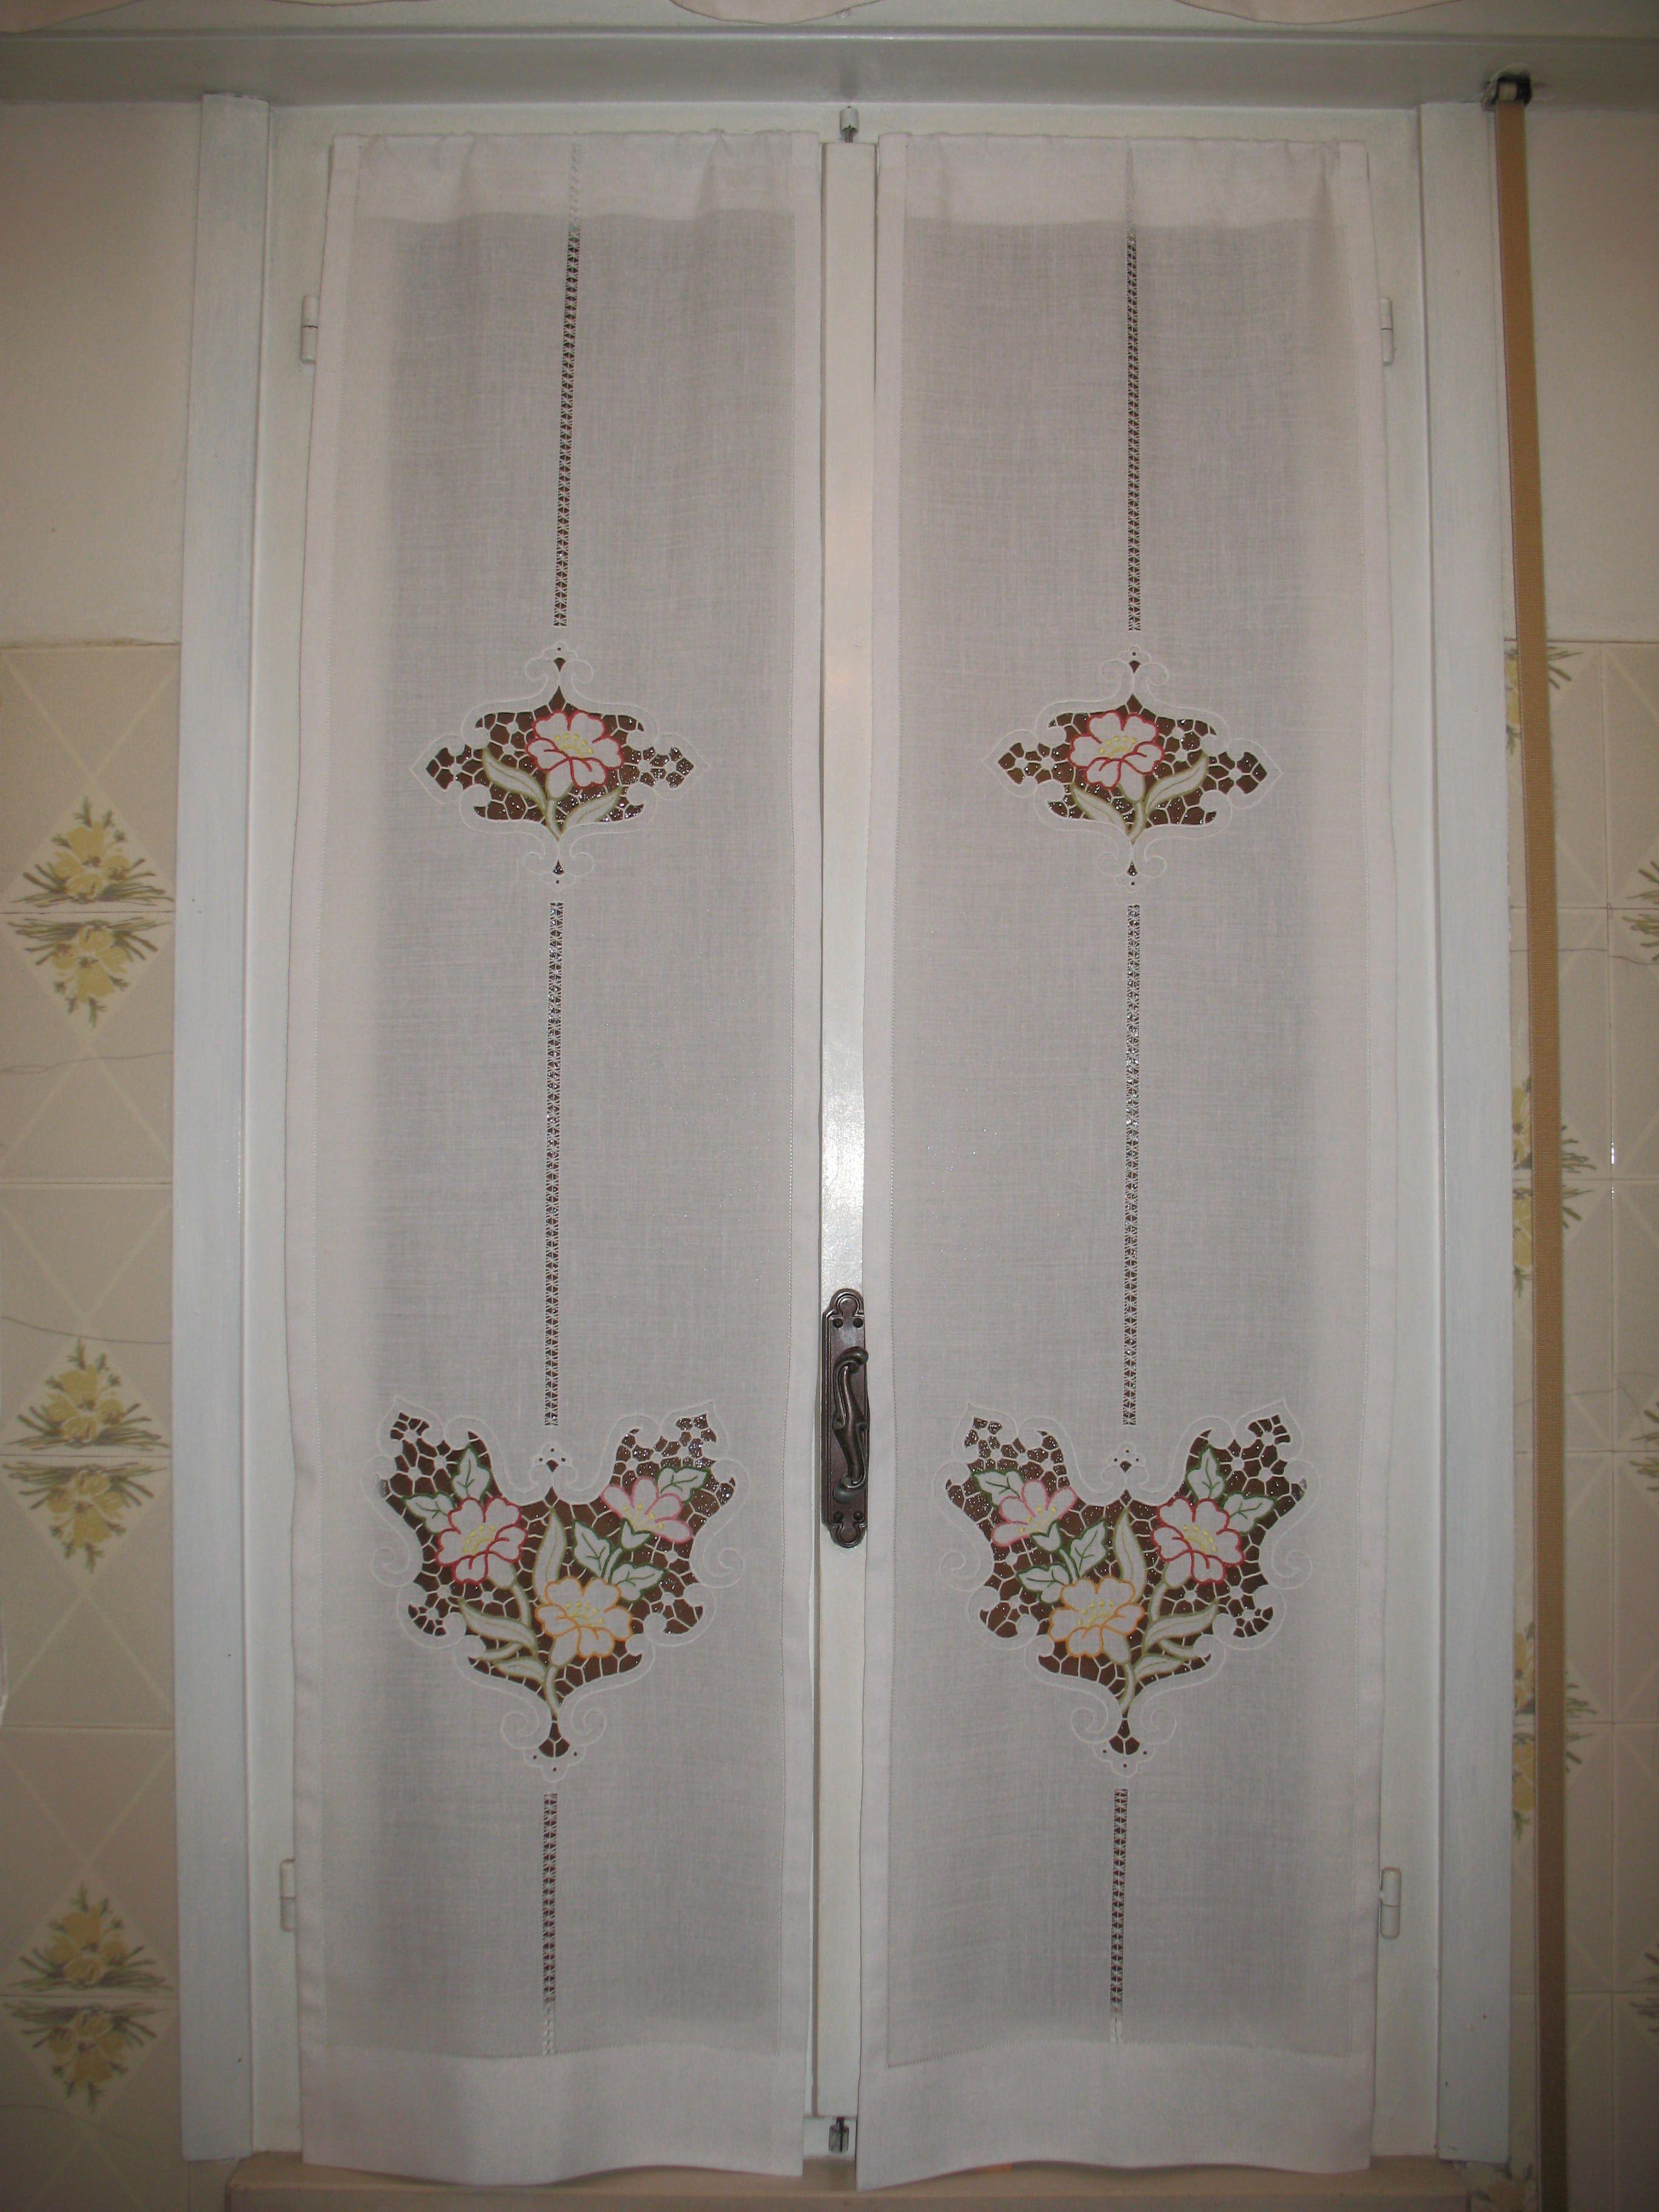 Tendine cucina a intaglio dall 39 album di barbara69 tende pinterest bordado cortinas e - Tende ricamate per cucina ...